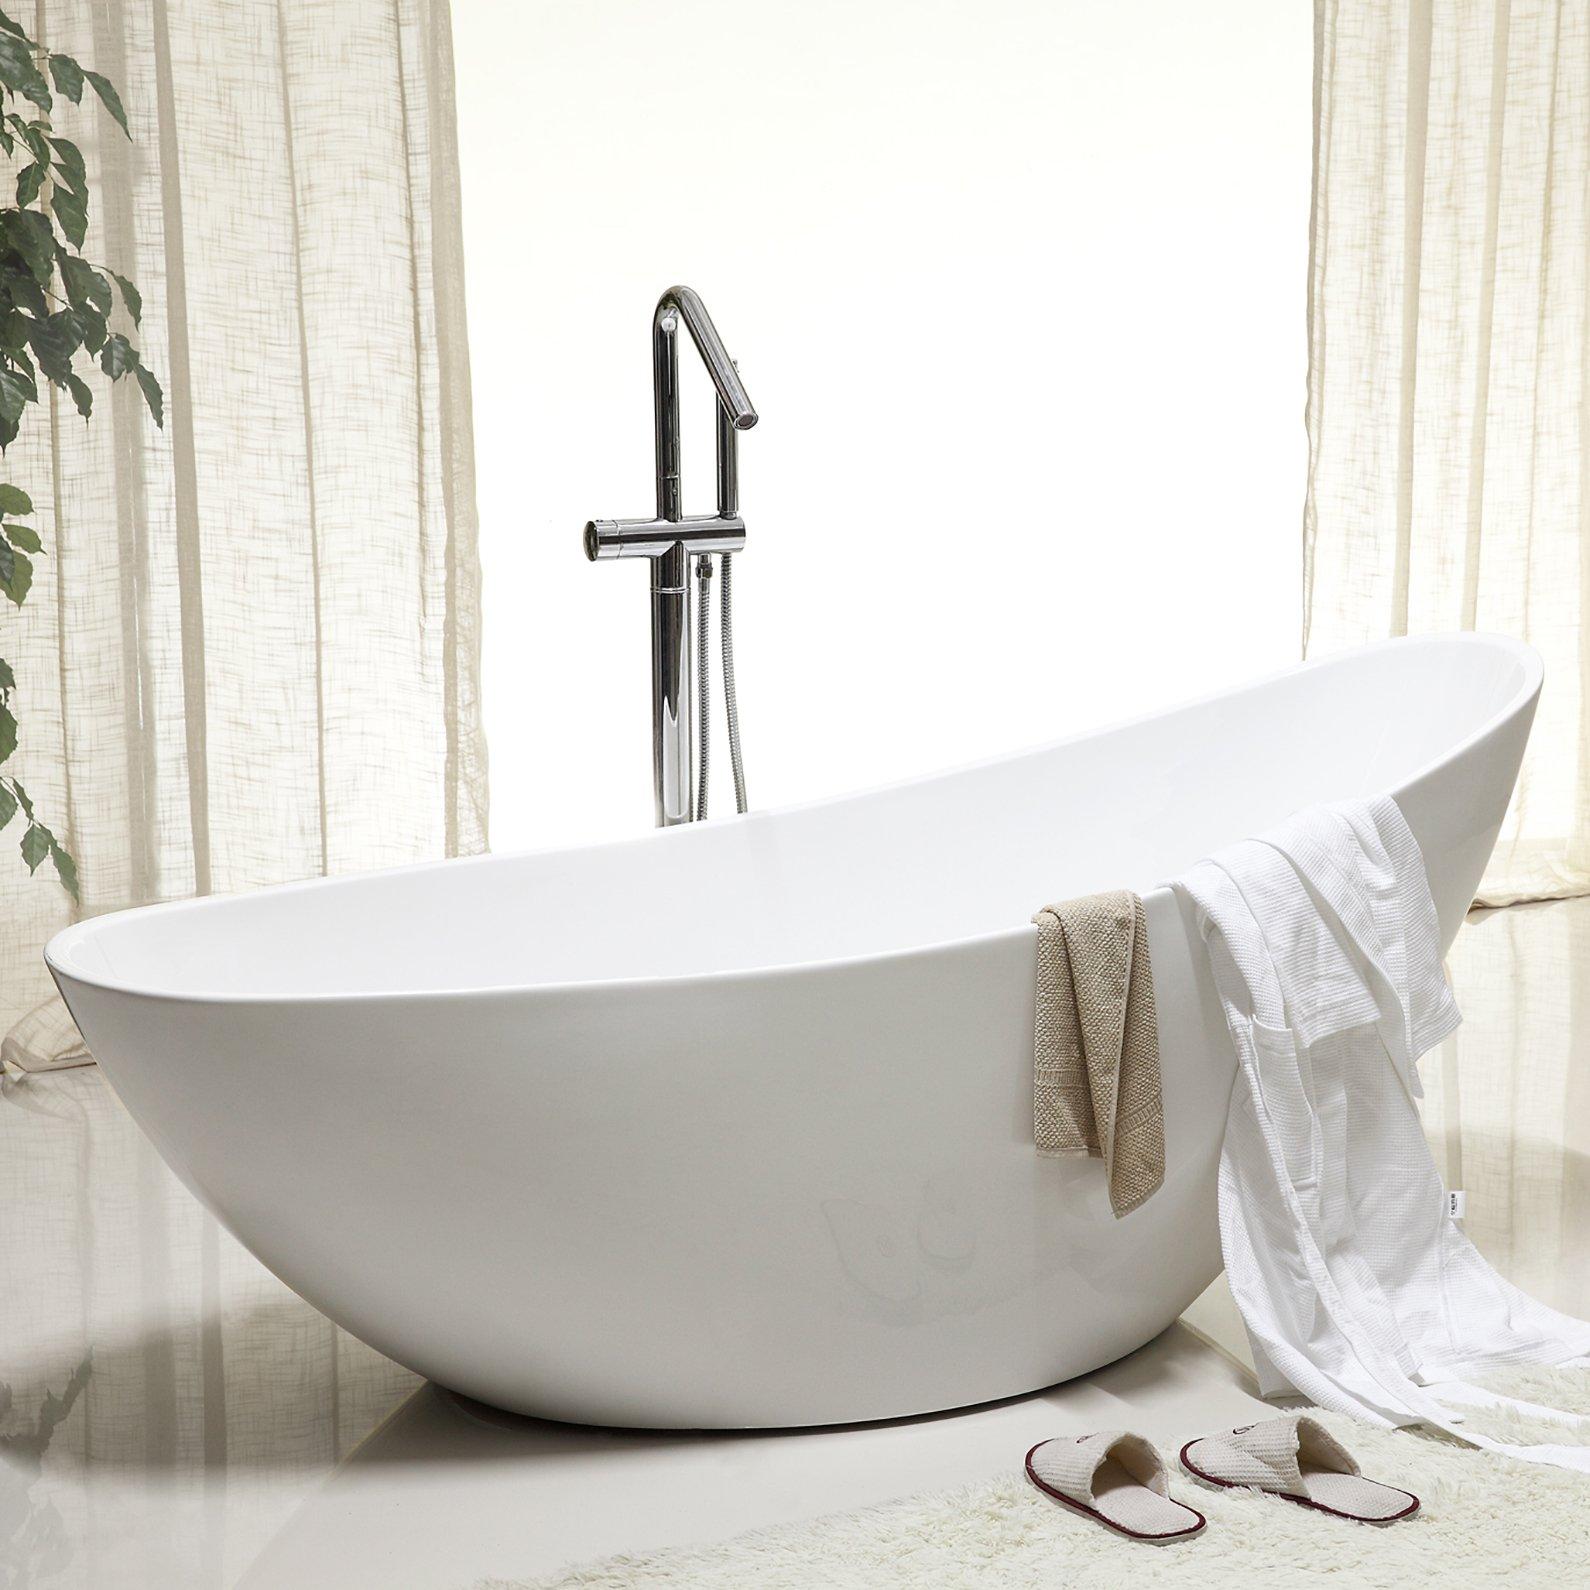 Freistehende Badewanne VICE aus Acryl - 183,5 x 78,5 x 77 cm - Farbe & Standarmatur wählbar